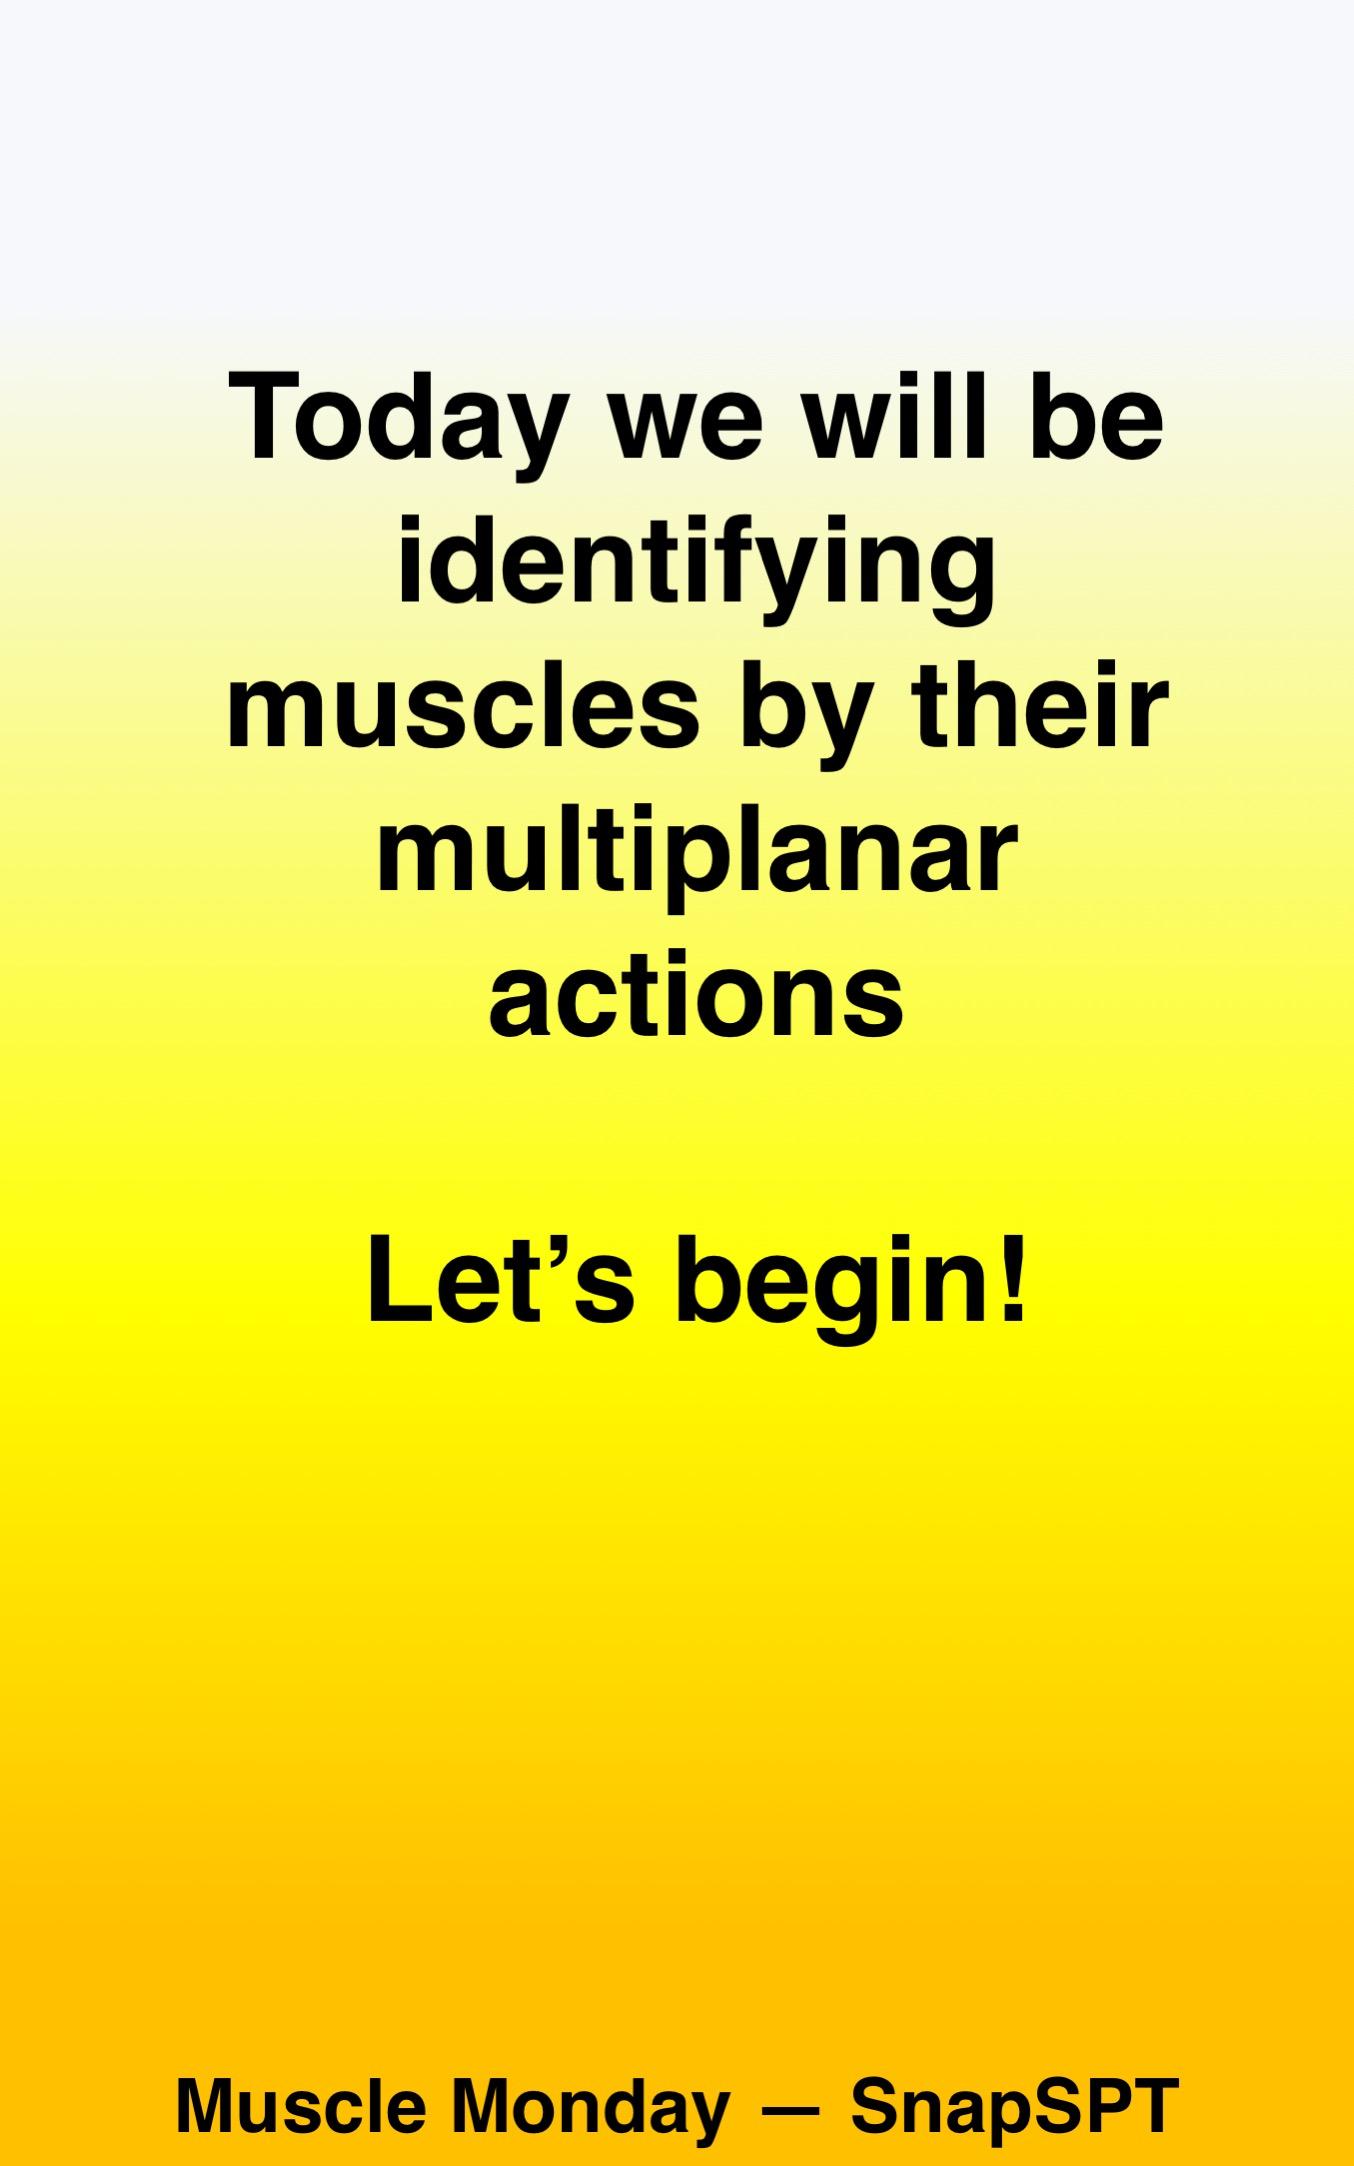 MuscleActions03.jpg